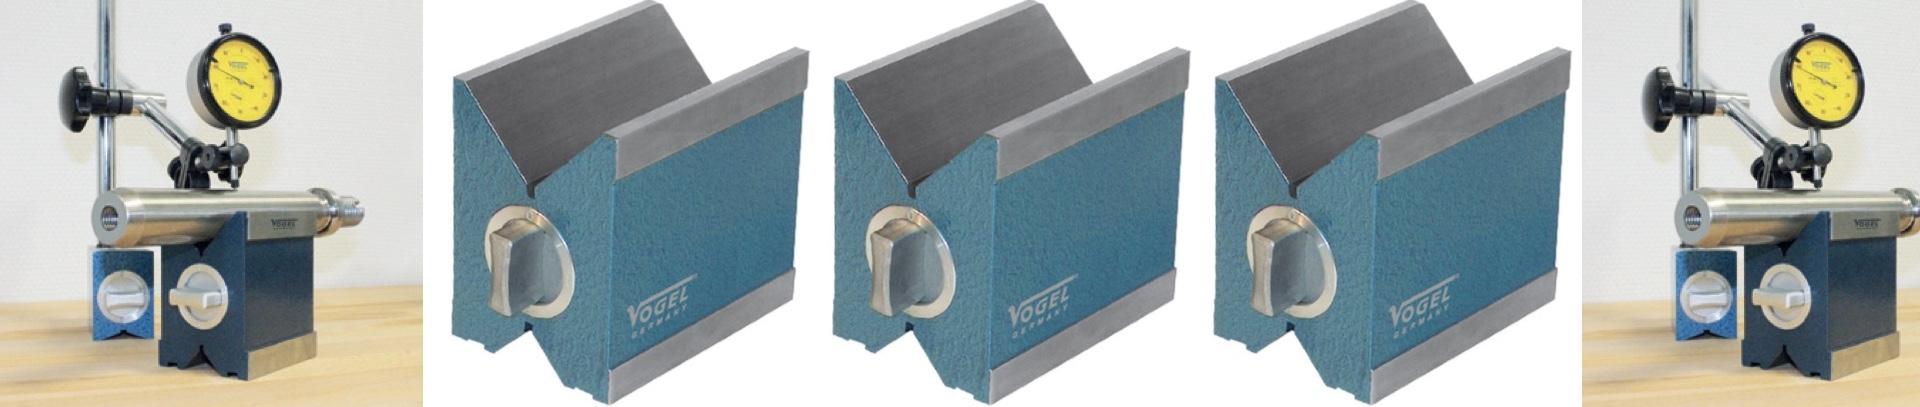 3301 khối V-Block có từ tính. Megnatic Measuring